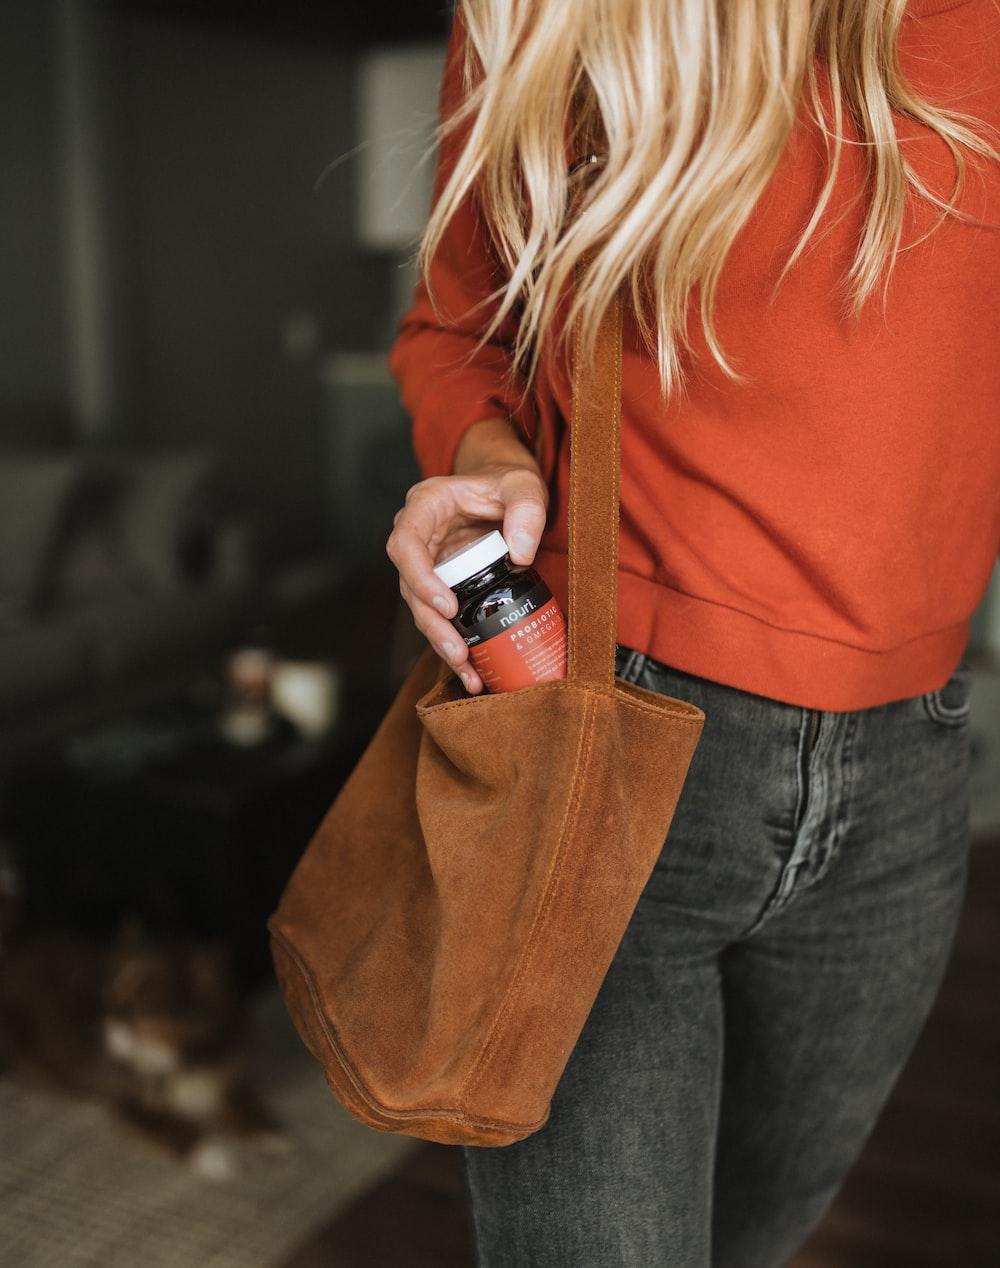 woman holding bottle on bag